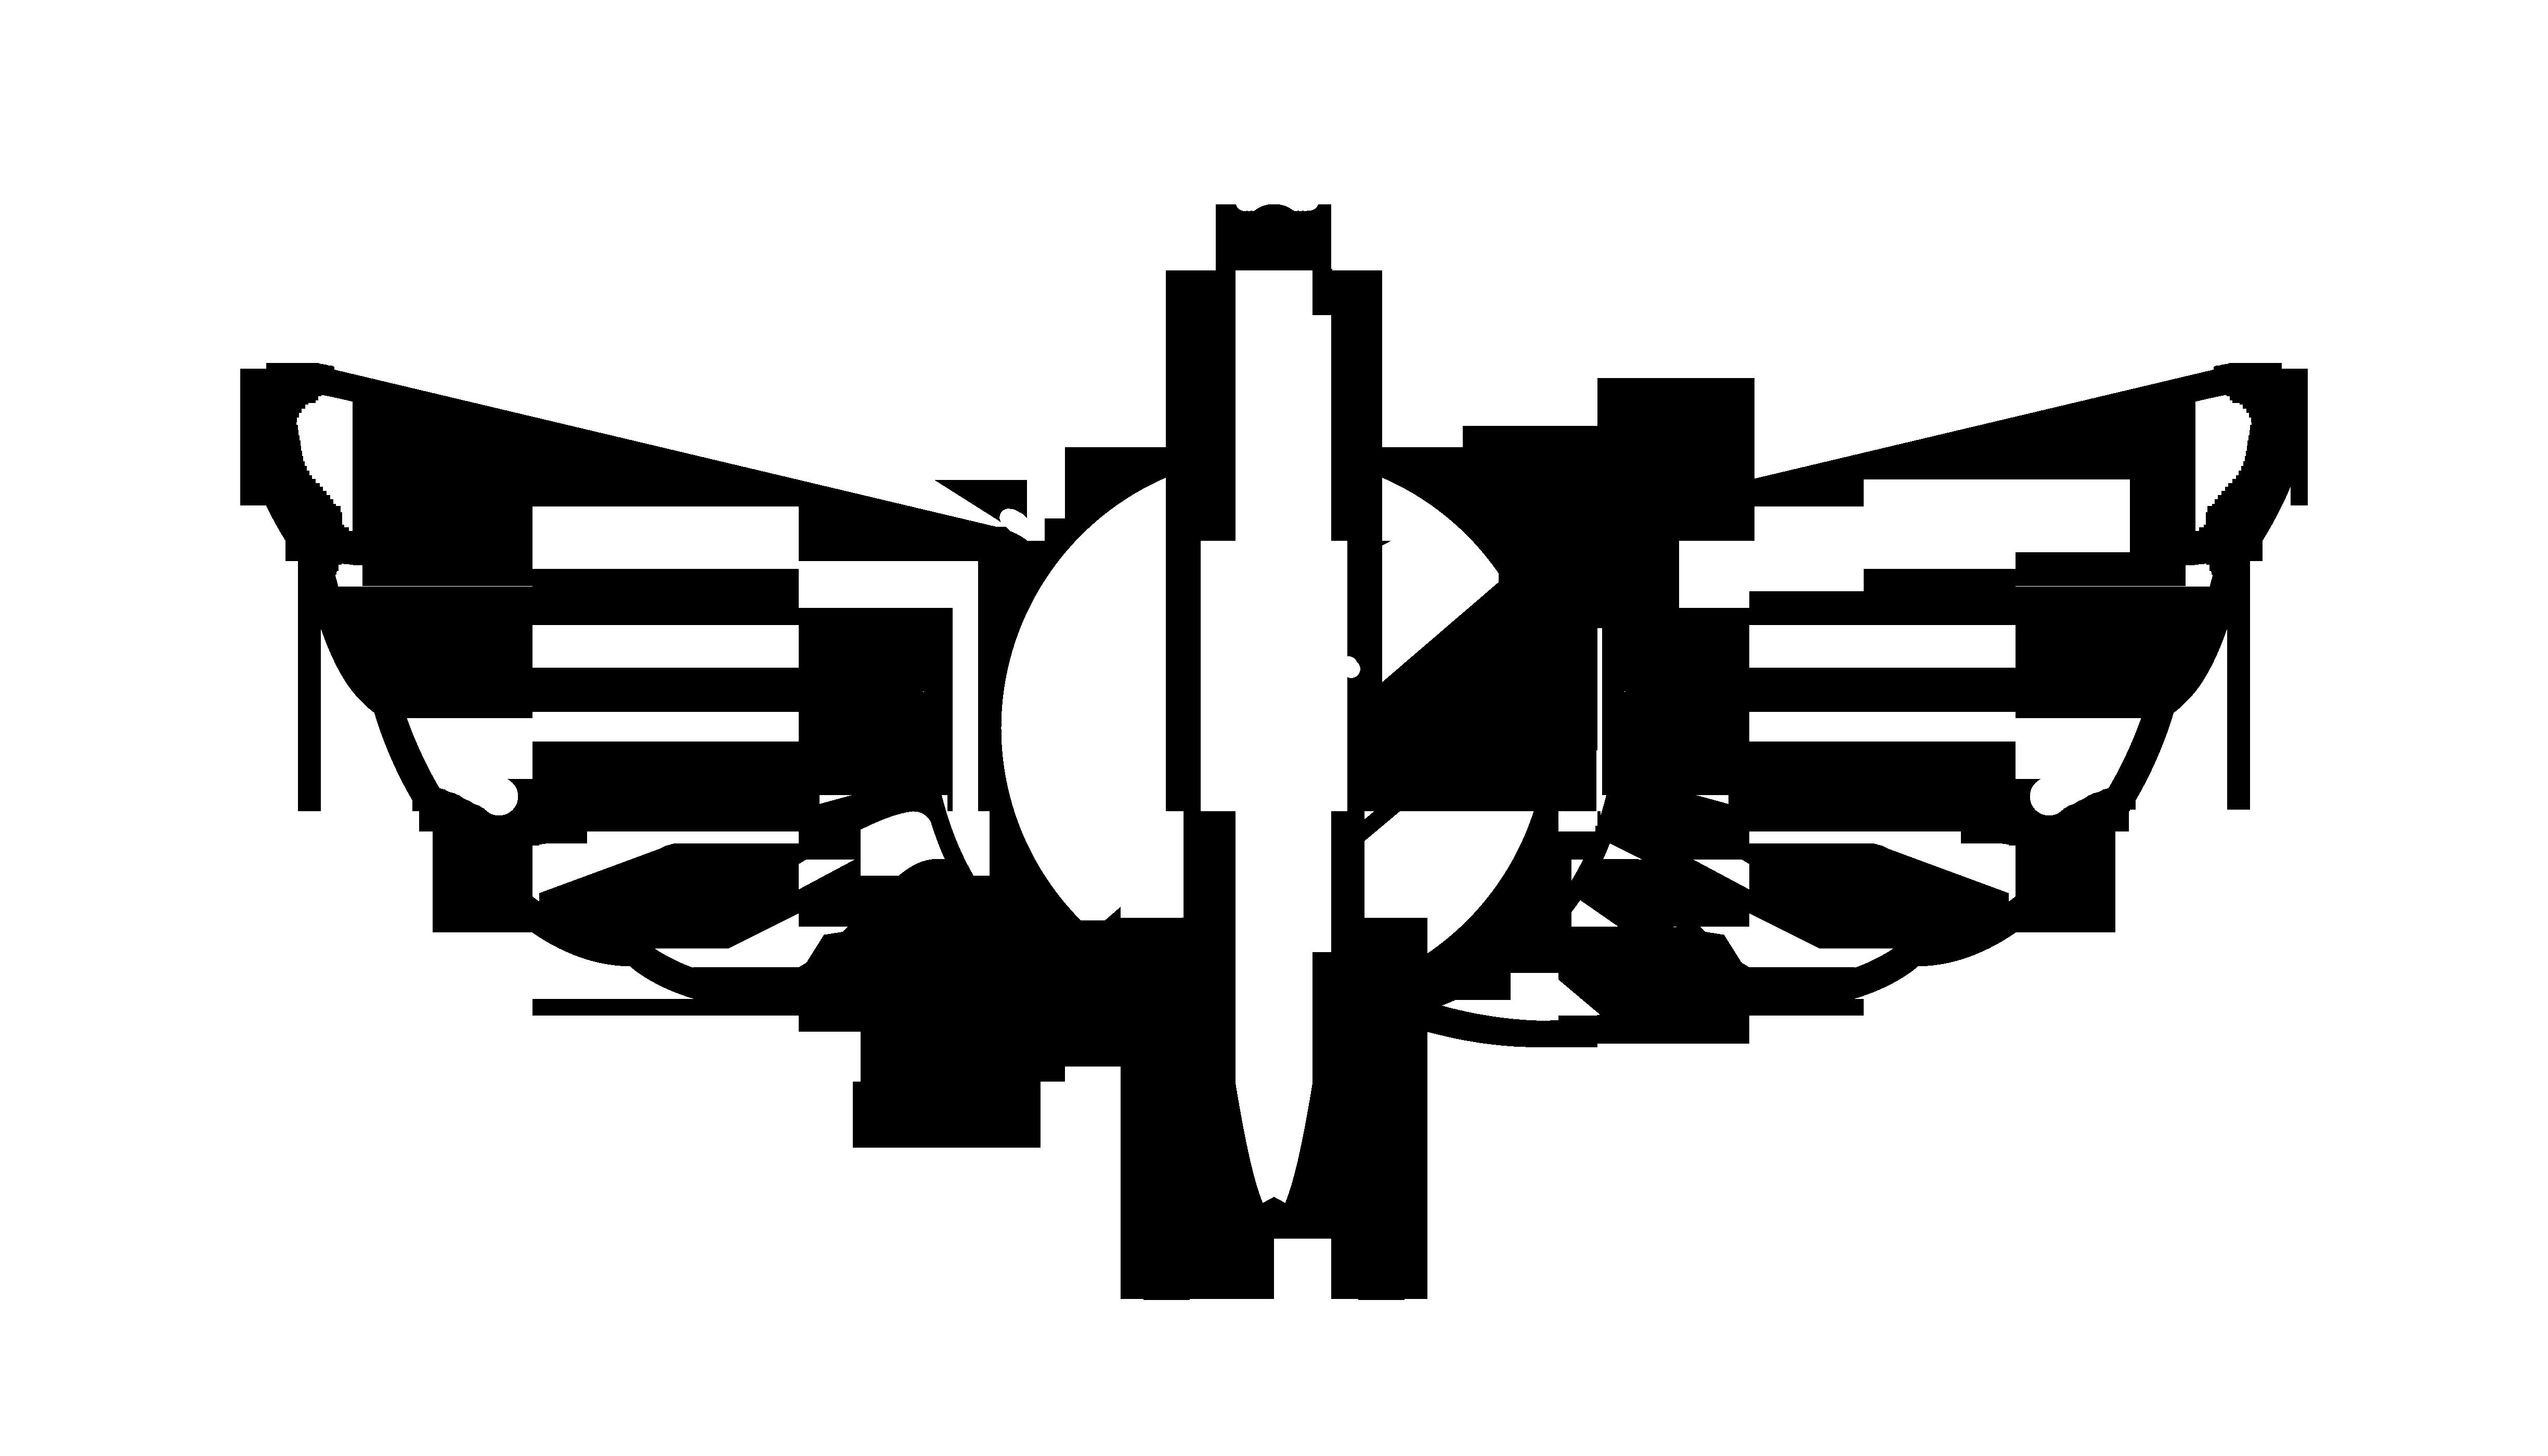 9 buzz light year logo 1 by randyfivesix designs interfaces logos